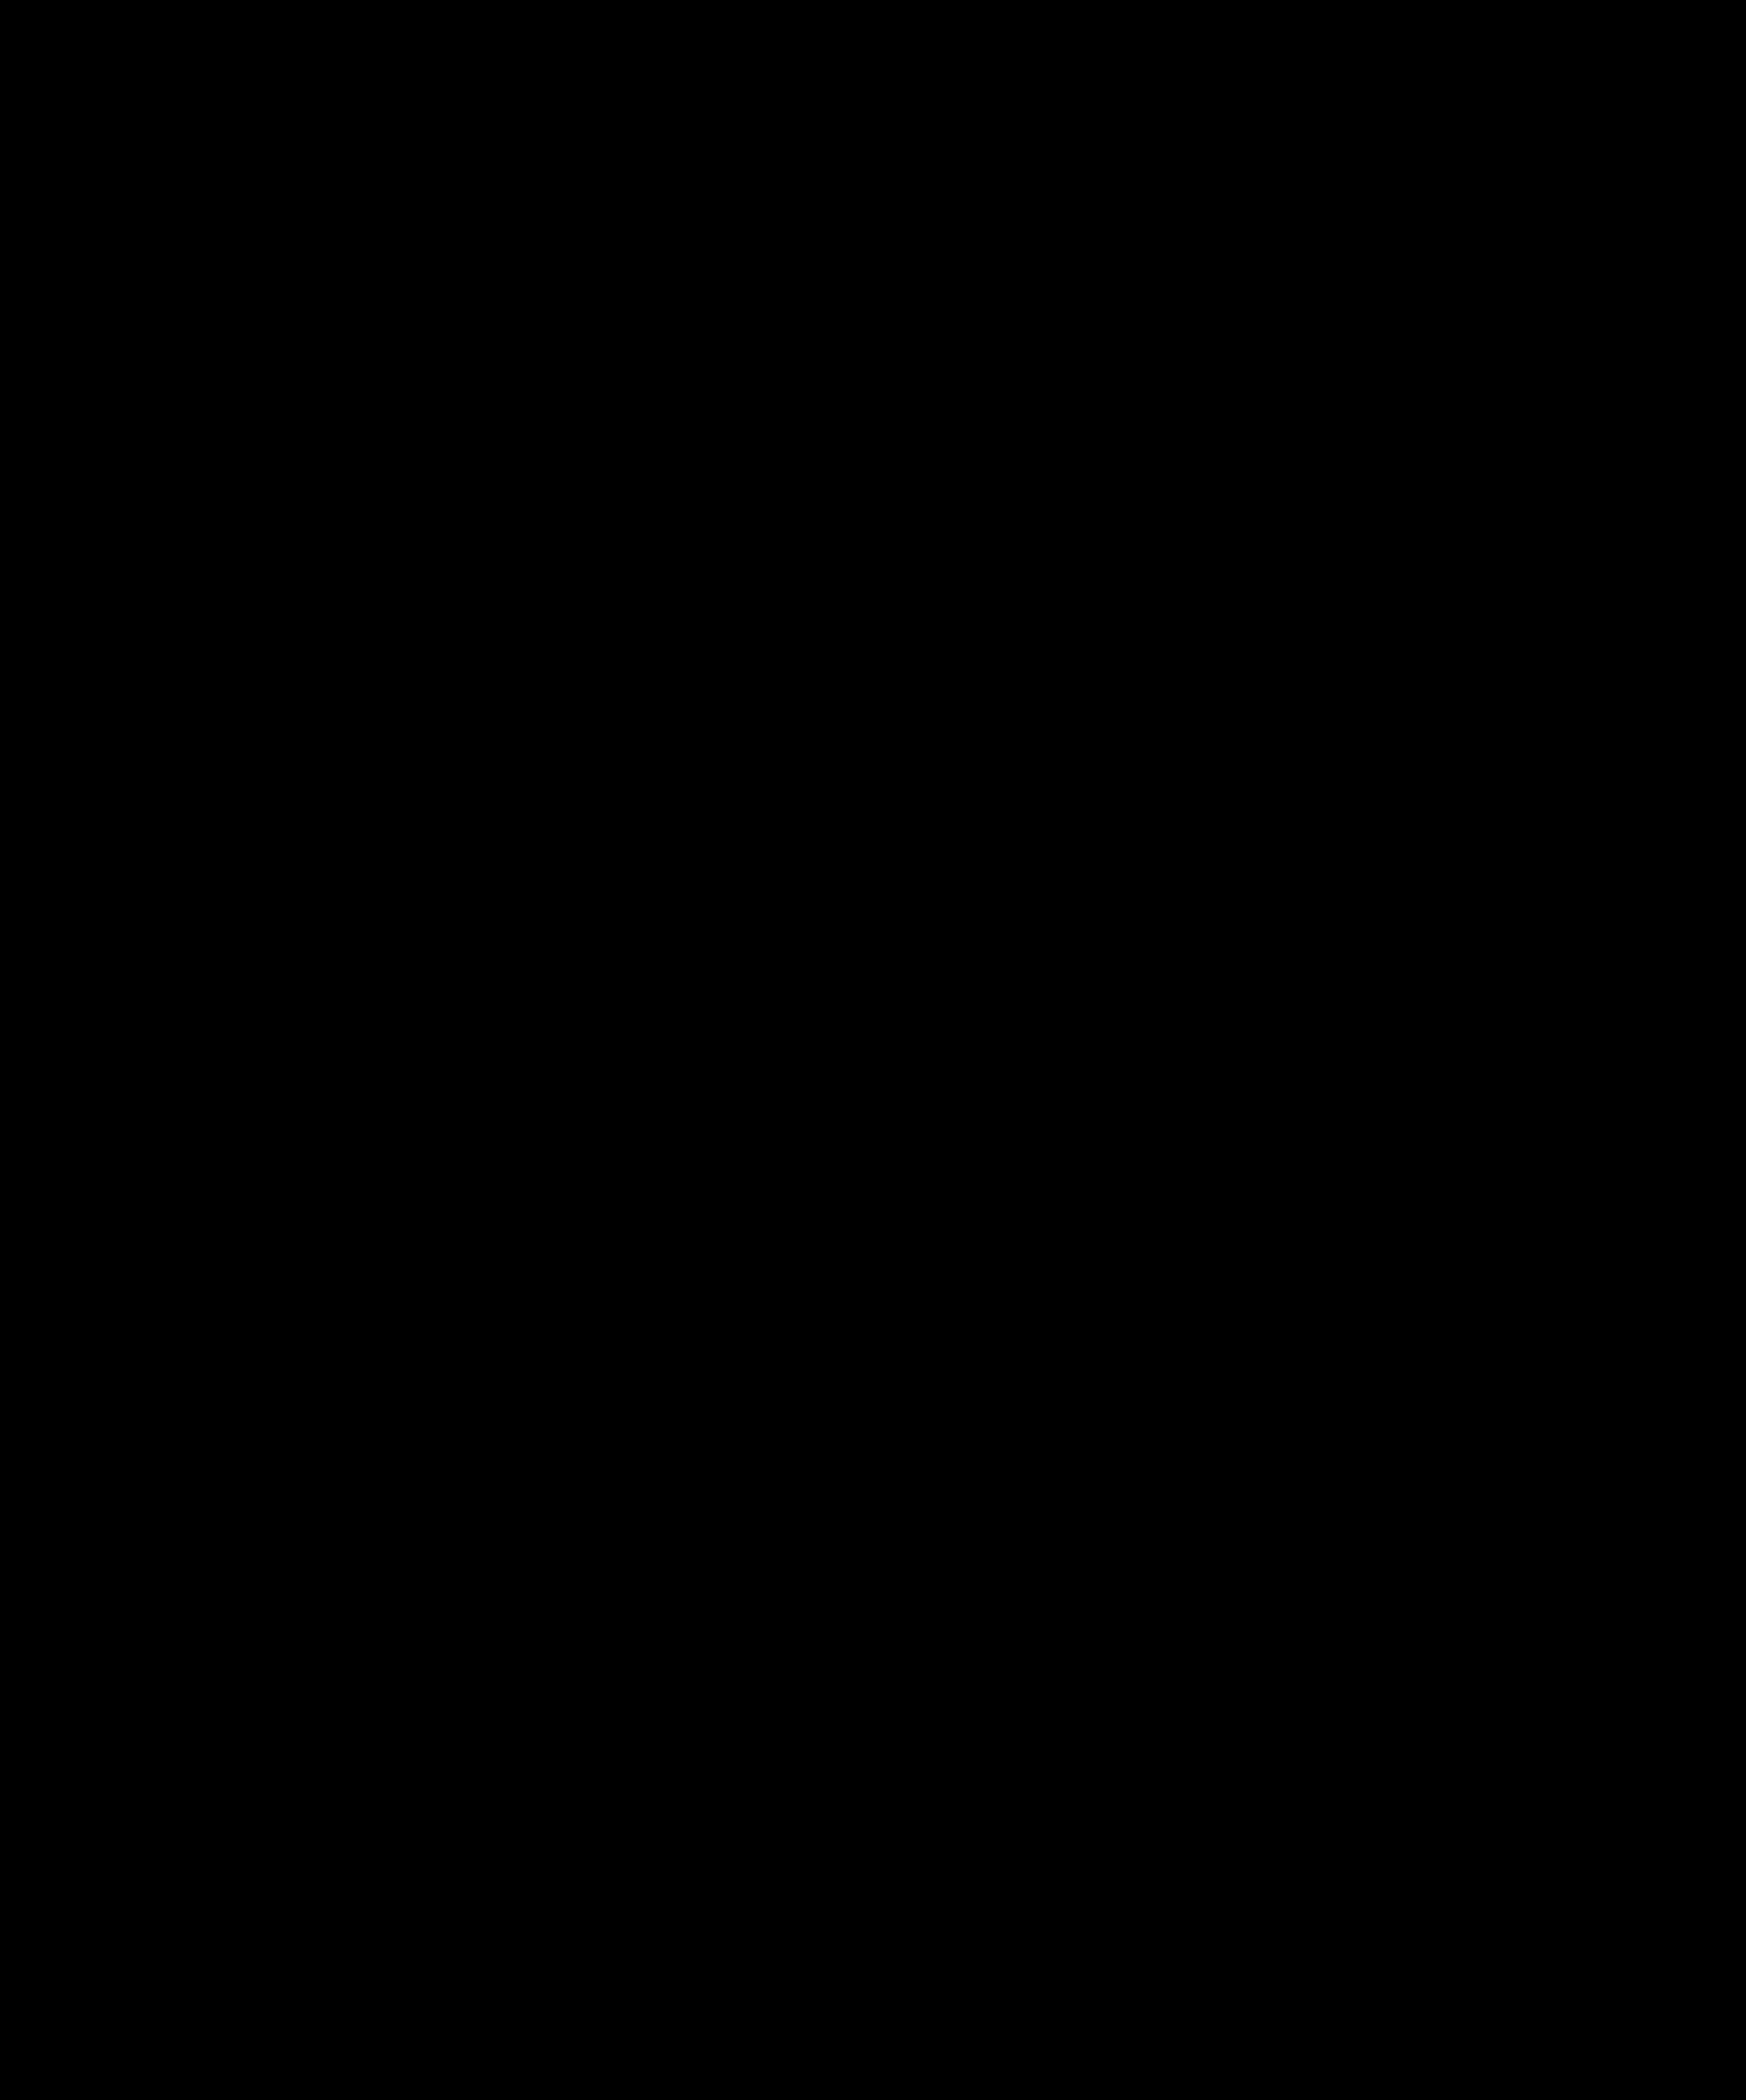 Clipart - Fire Silhouette